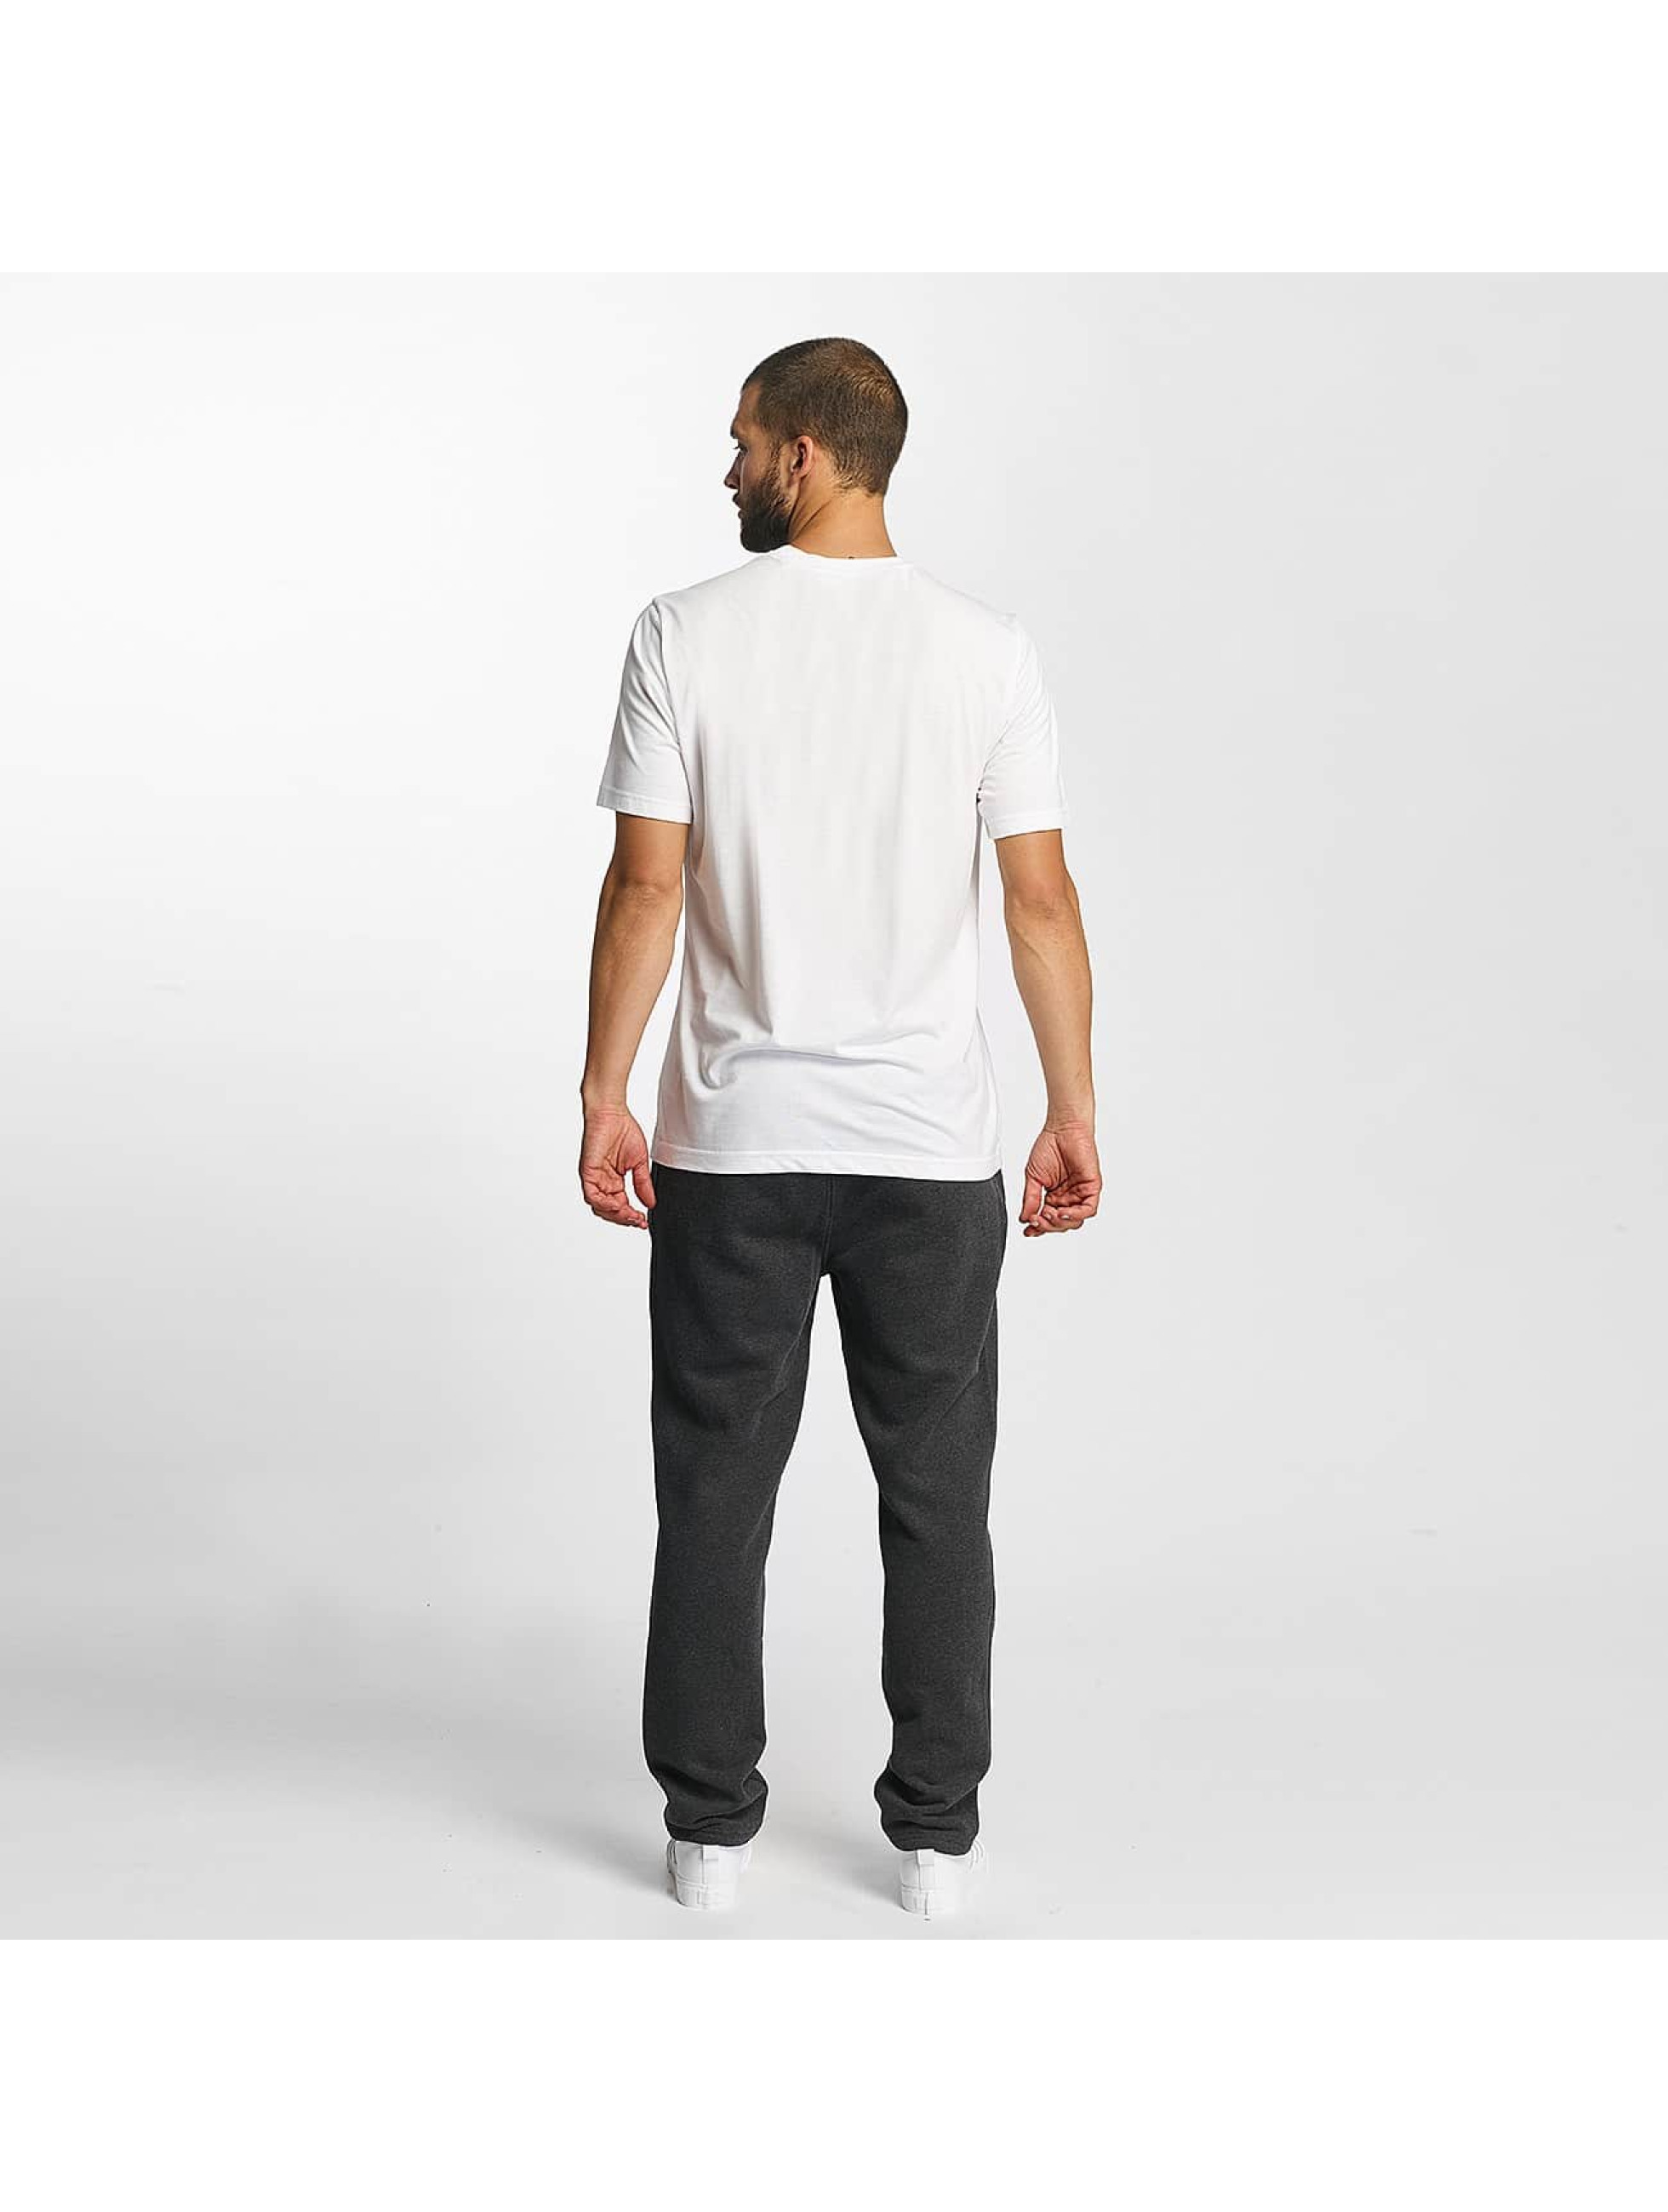 Bench Pantalón deportivo Branded Marl gris